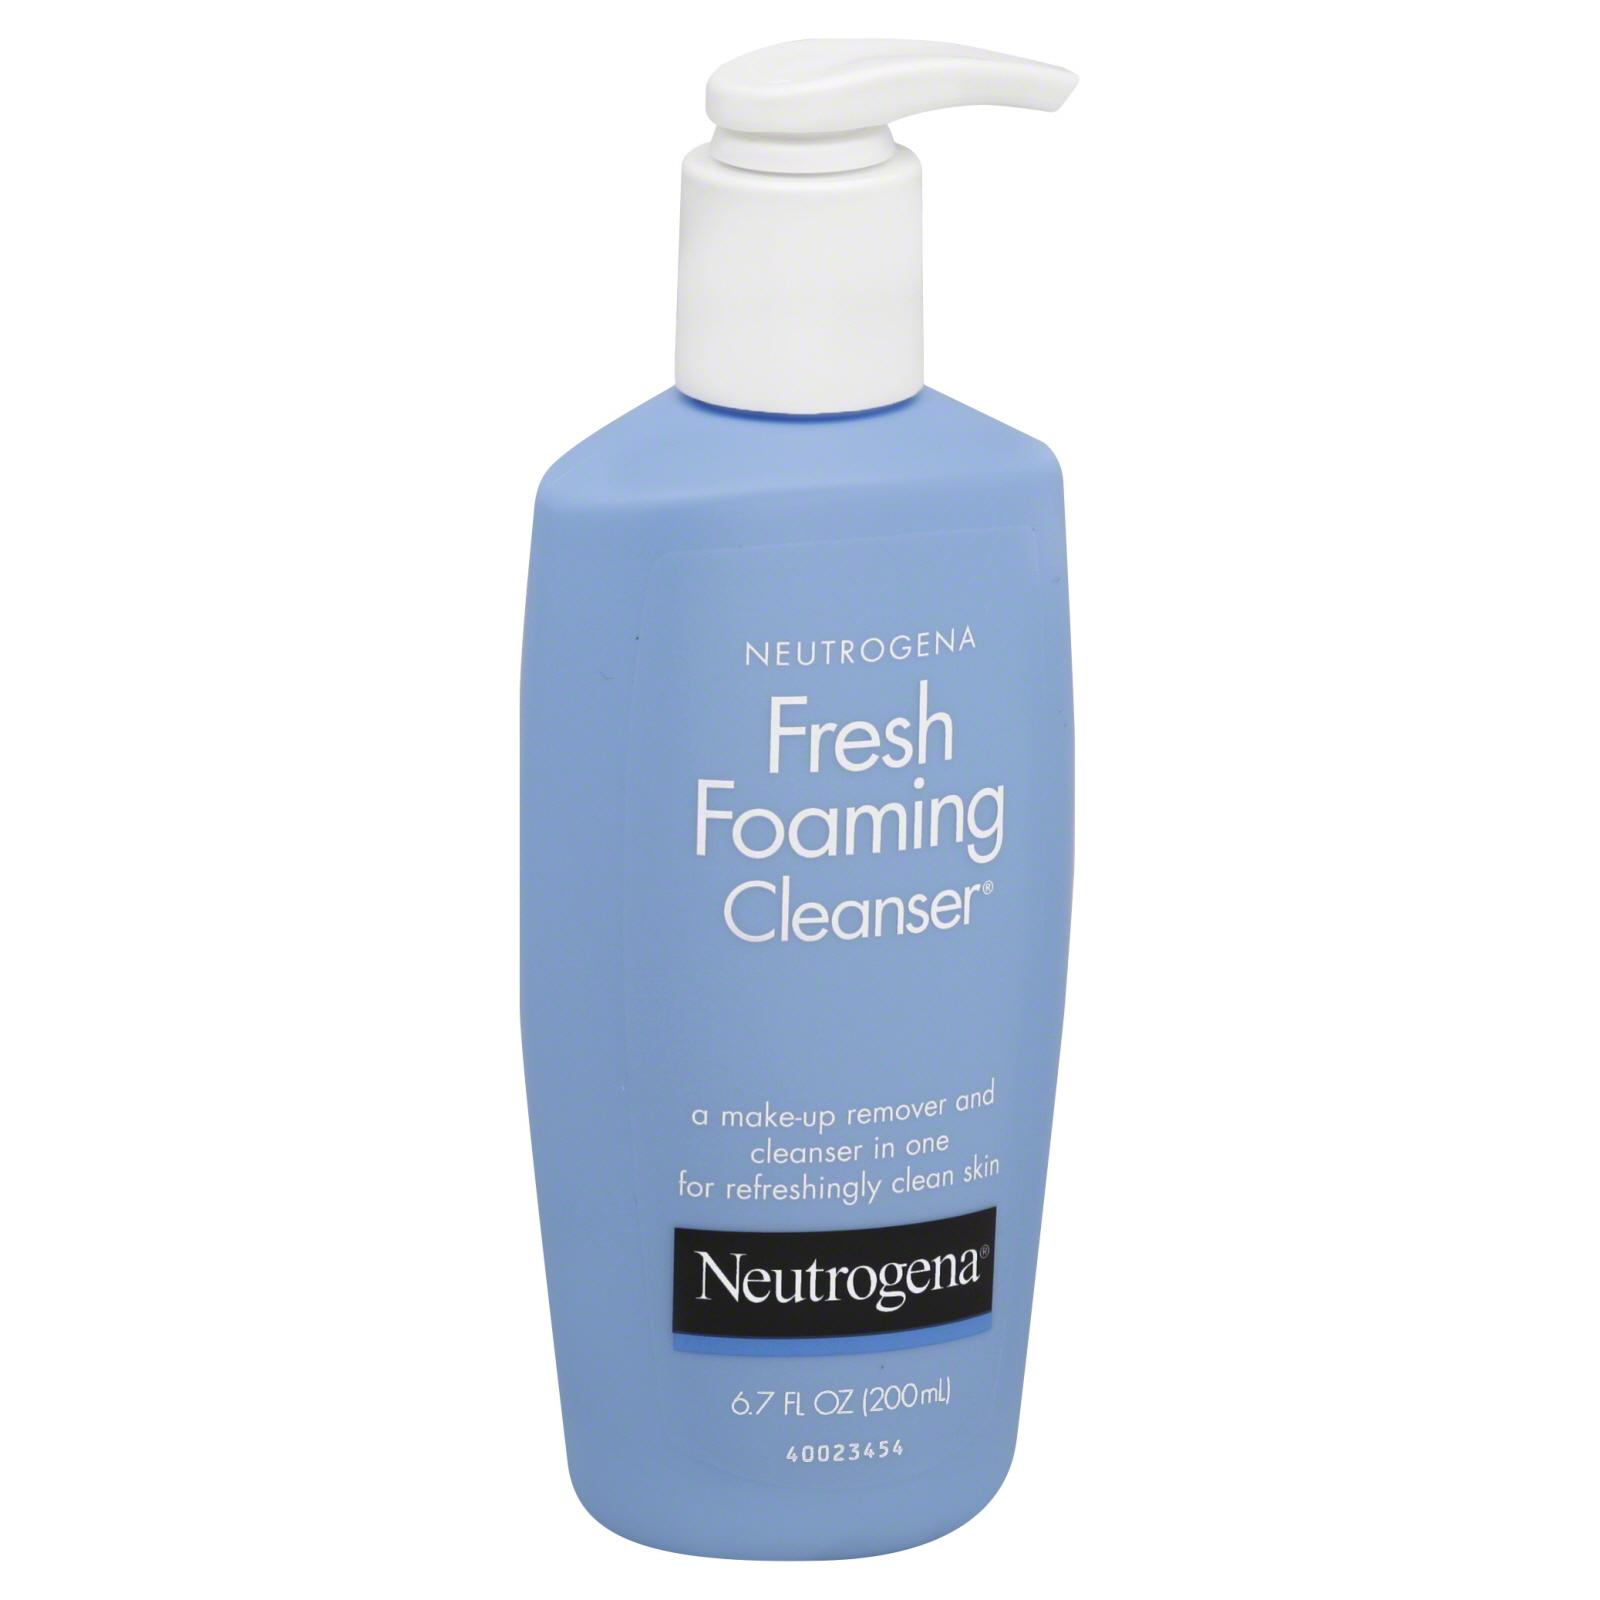 Sữa Rửa Mặt Tẩy Trang 2in1 Neutrogena Fresh Foaming Cleanser